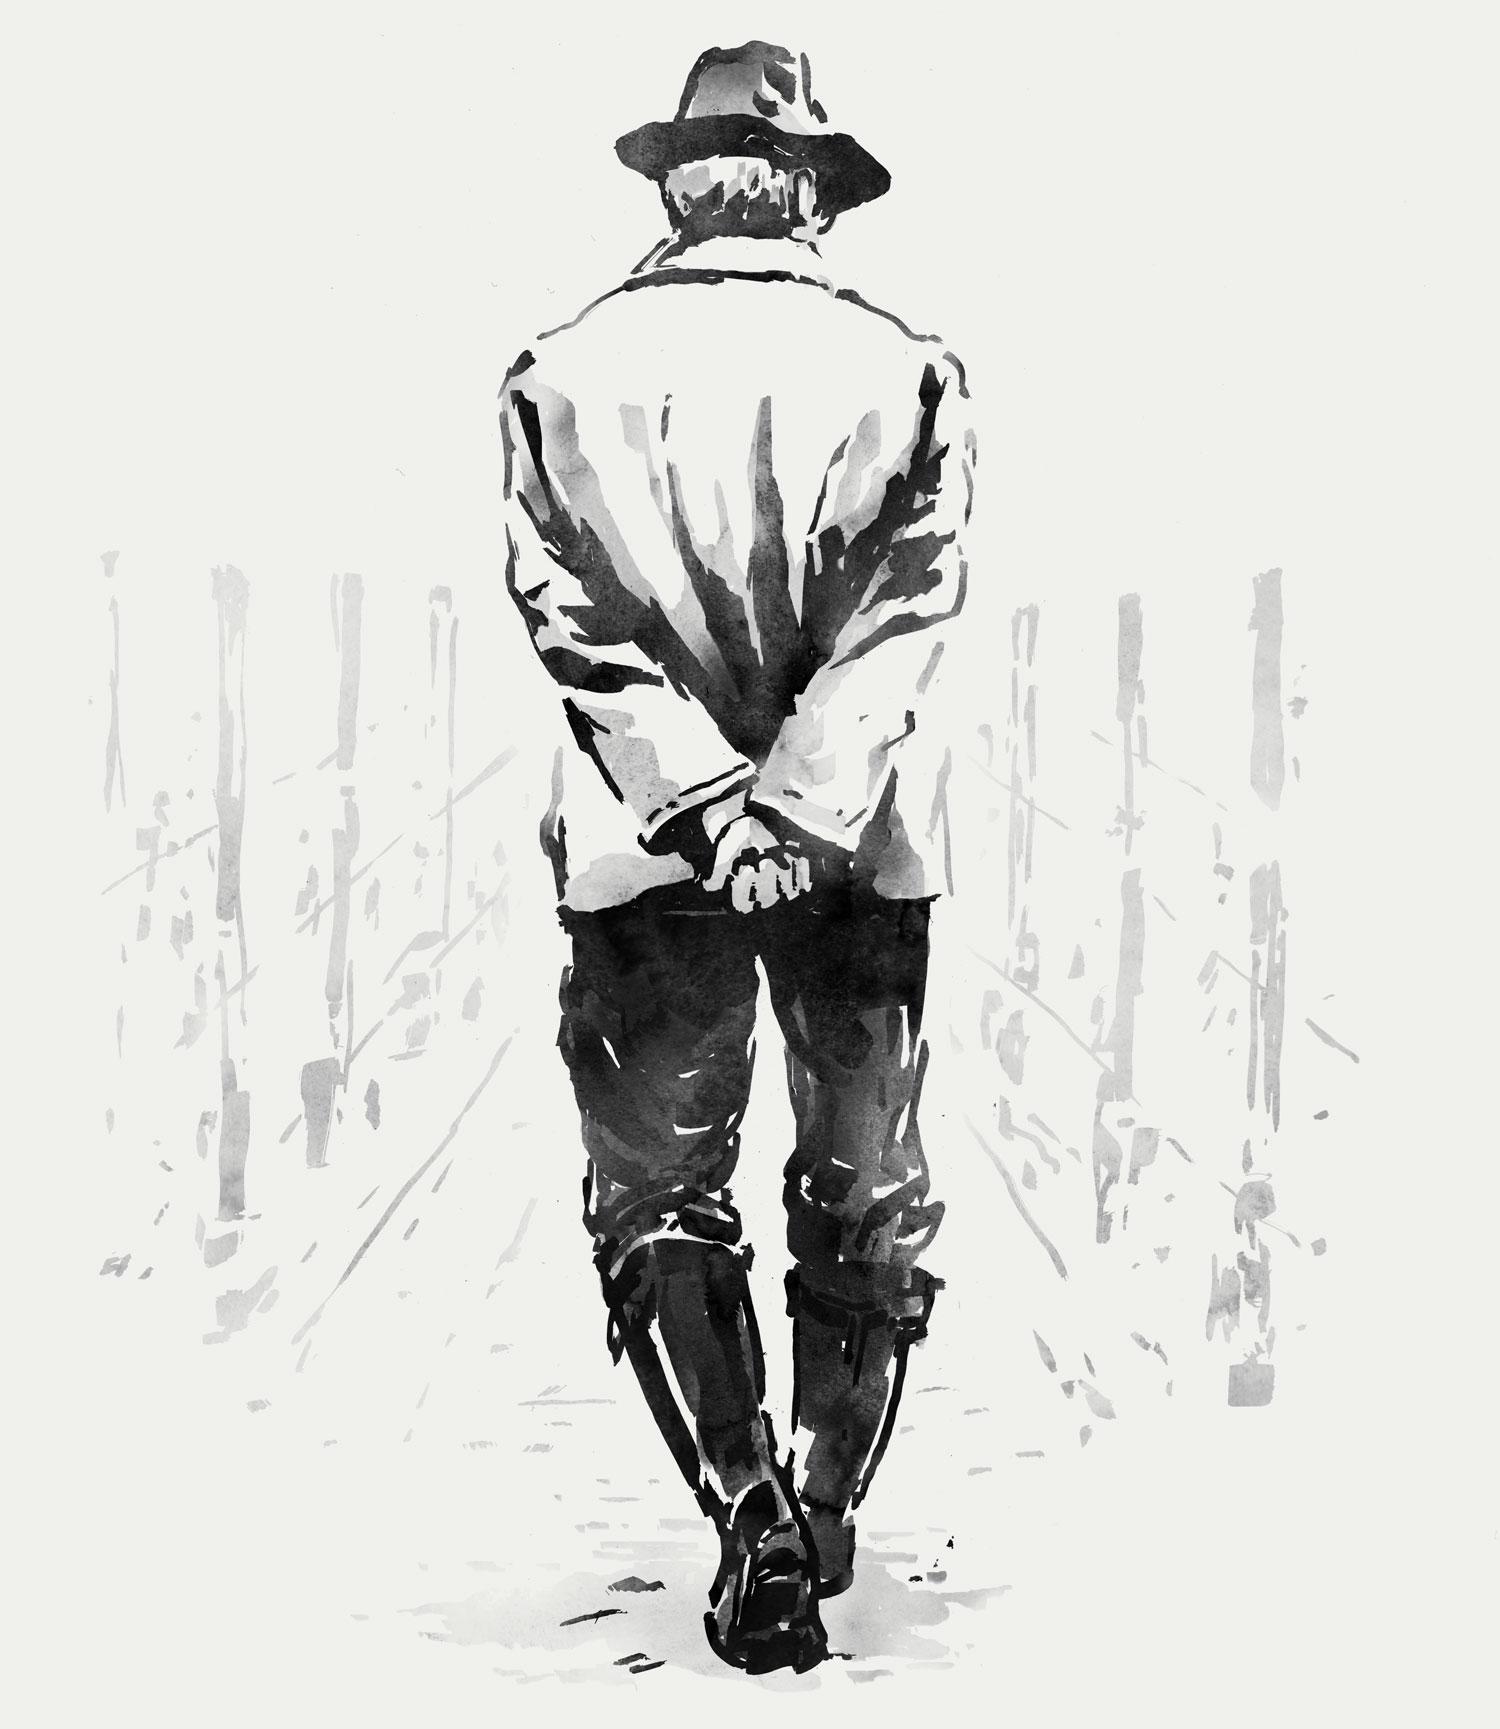 Gentleman farmer illustration